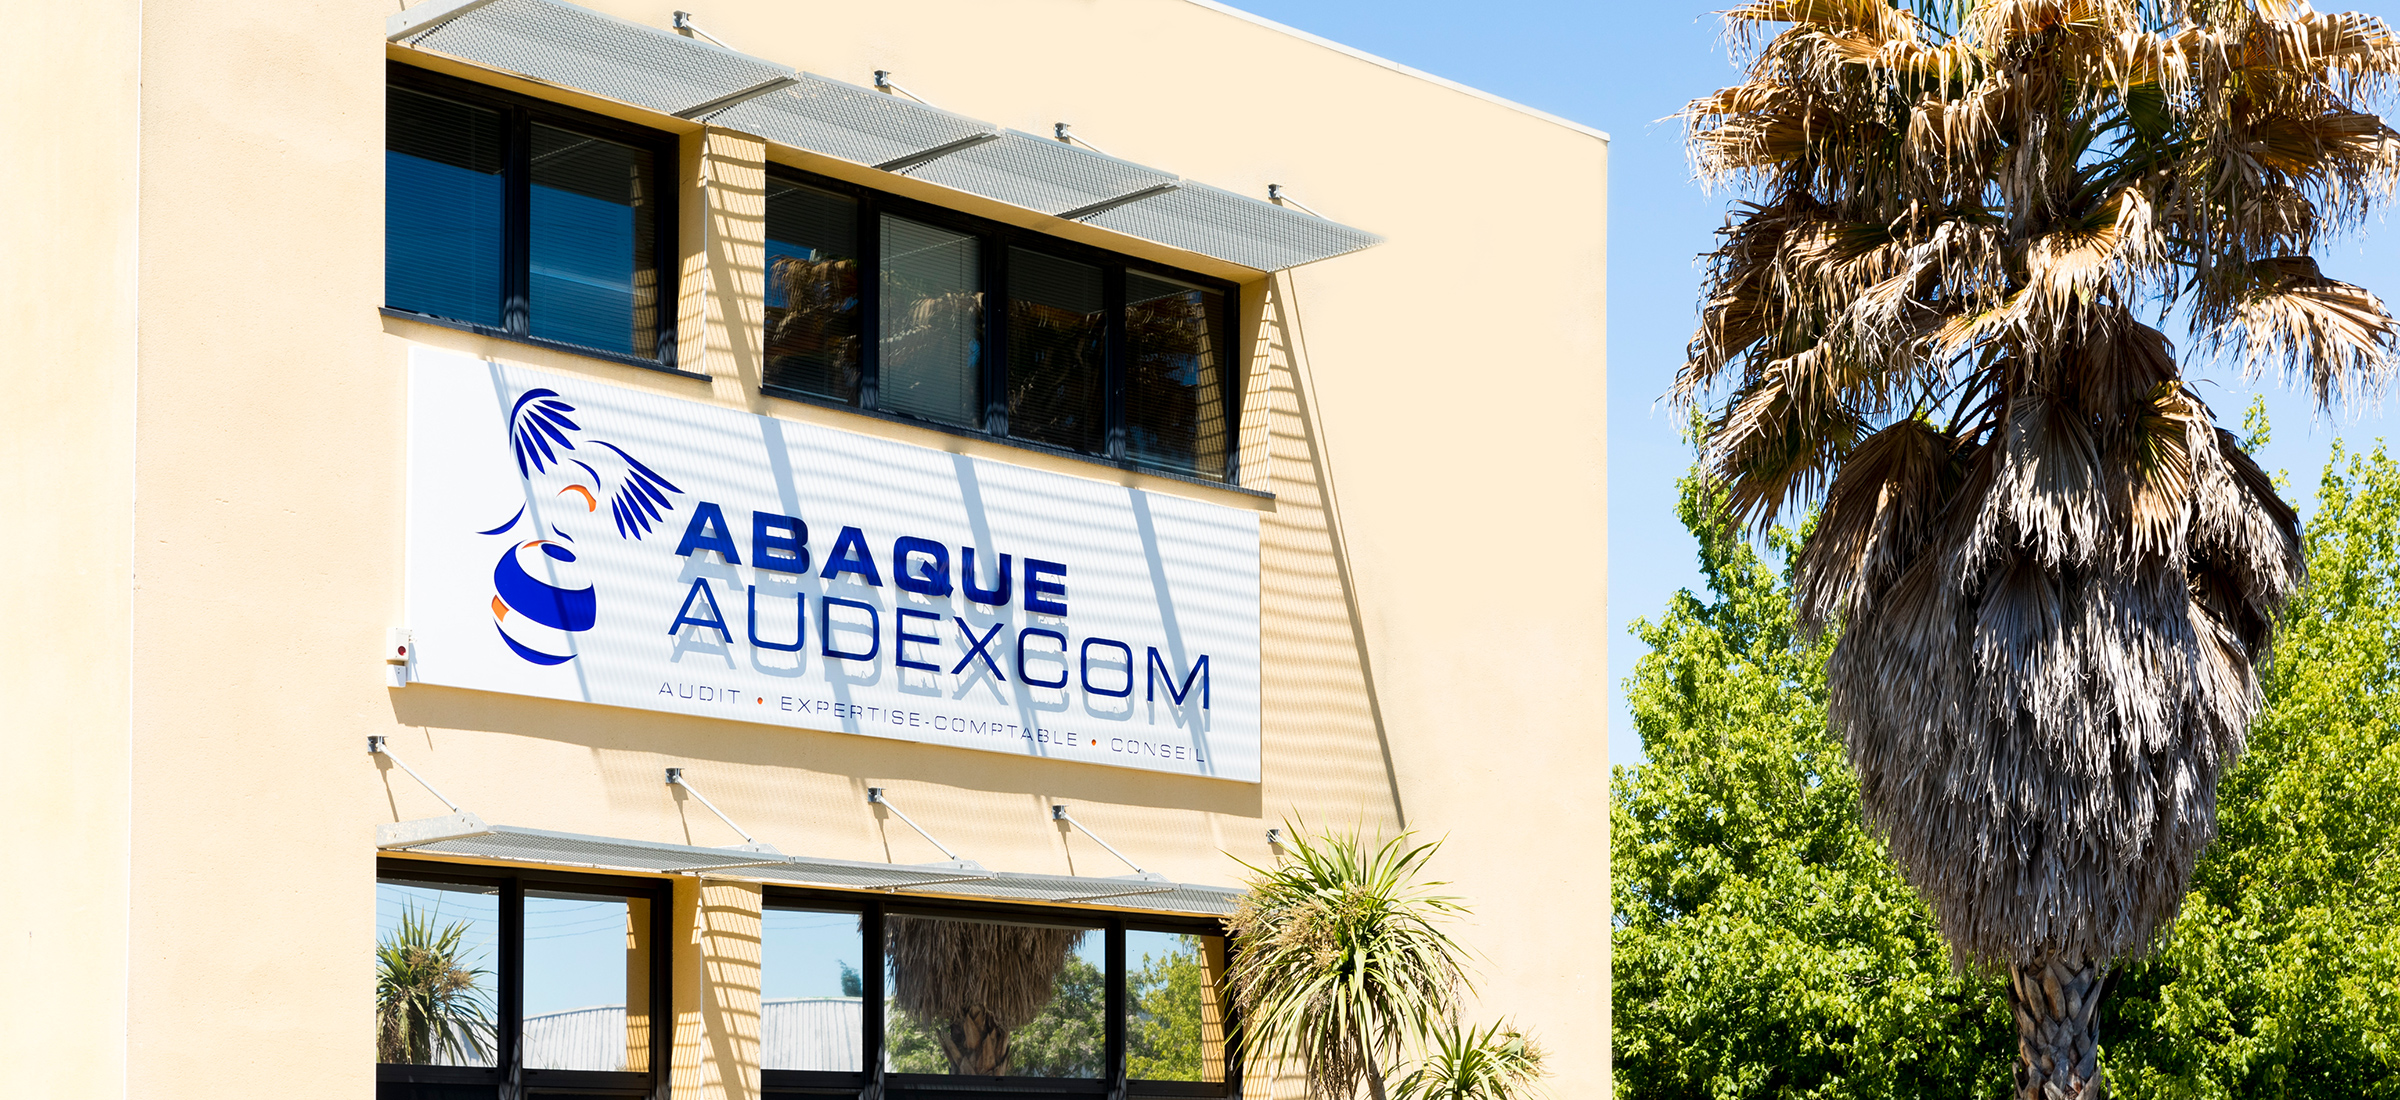 Cabinet expertise comptable montpellier - Cabinet de recrutement montpellier ...